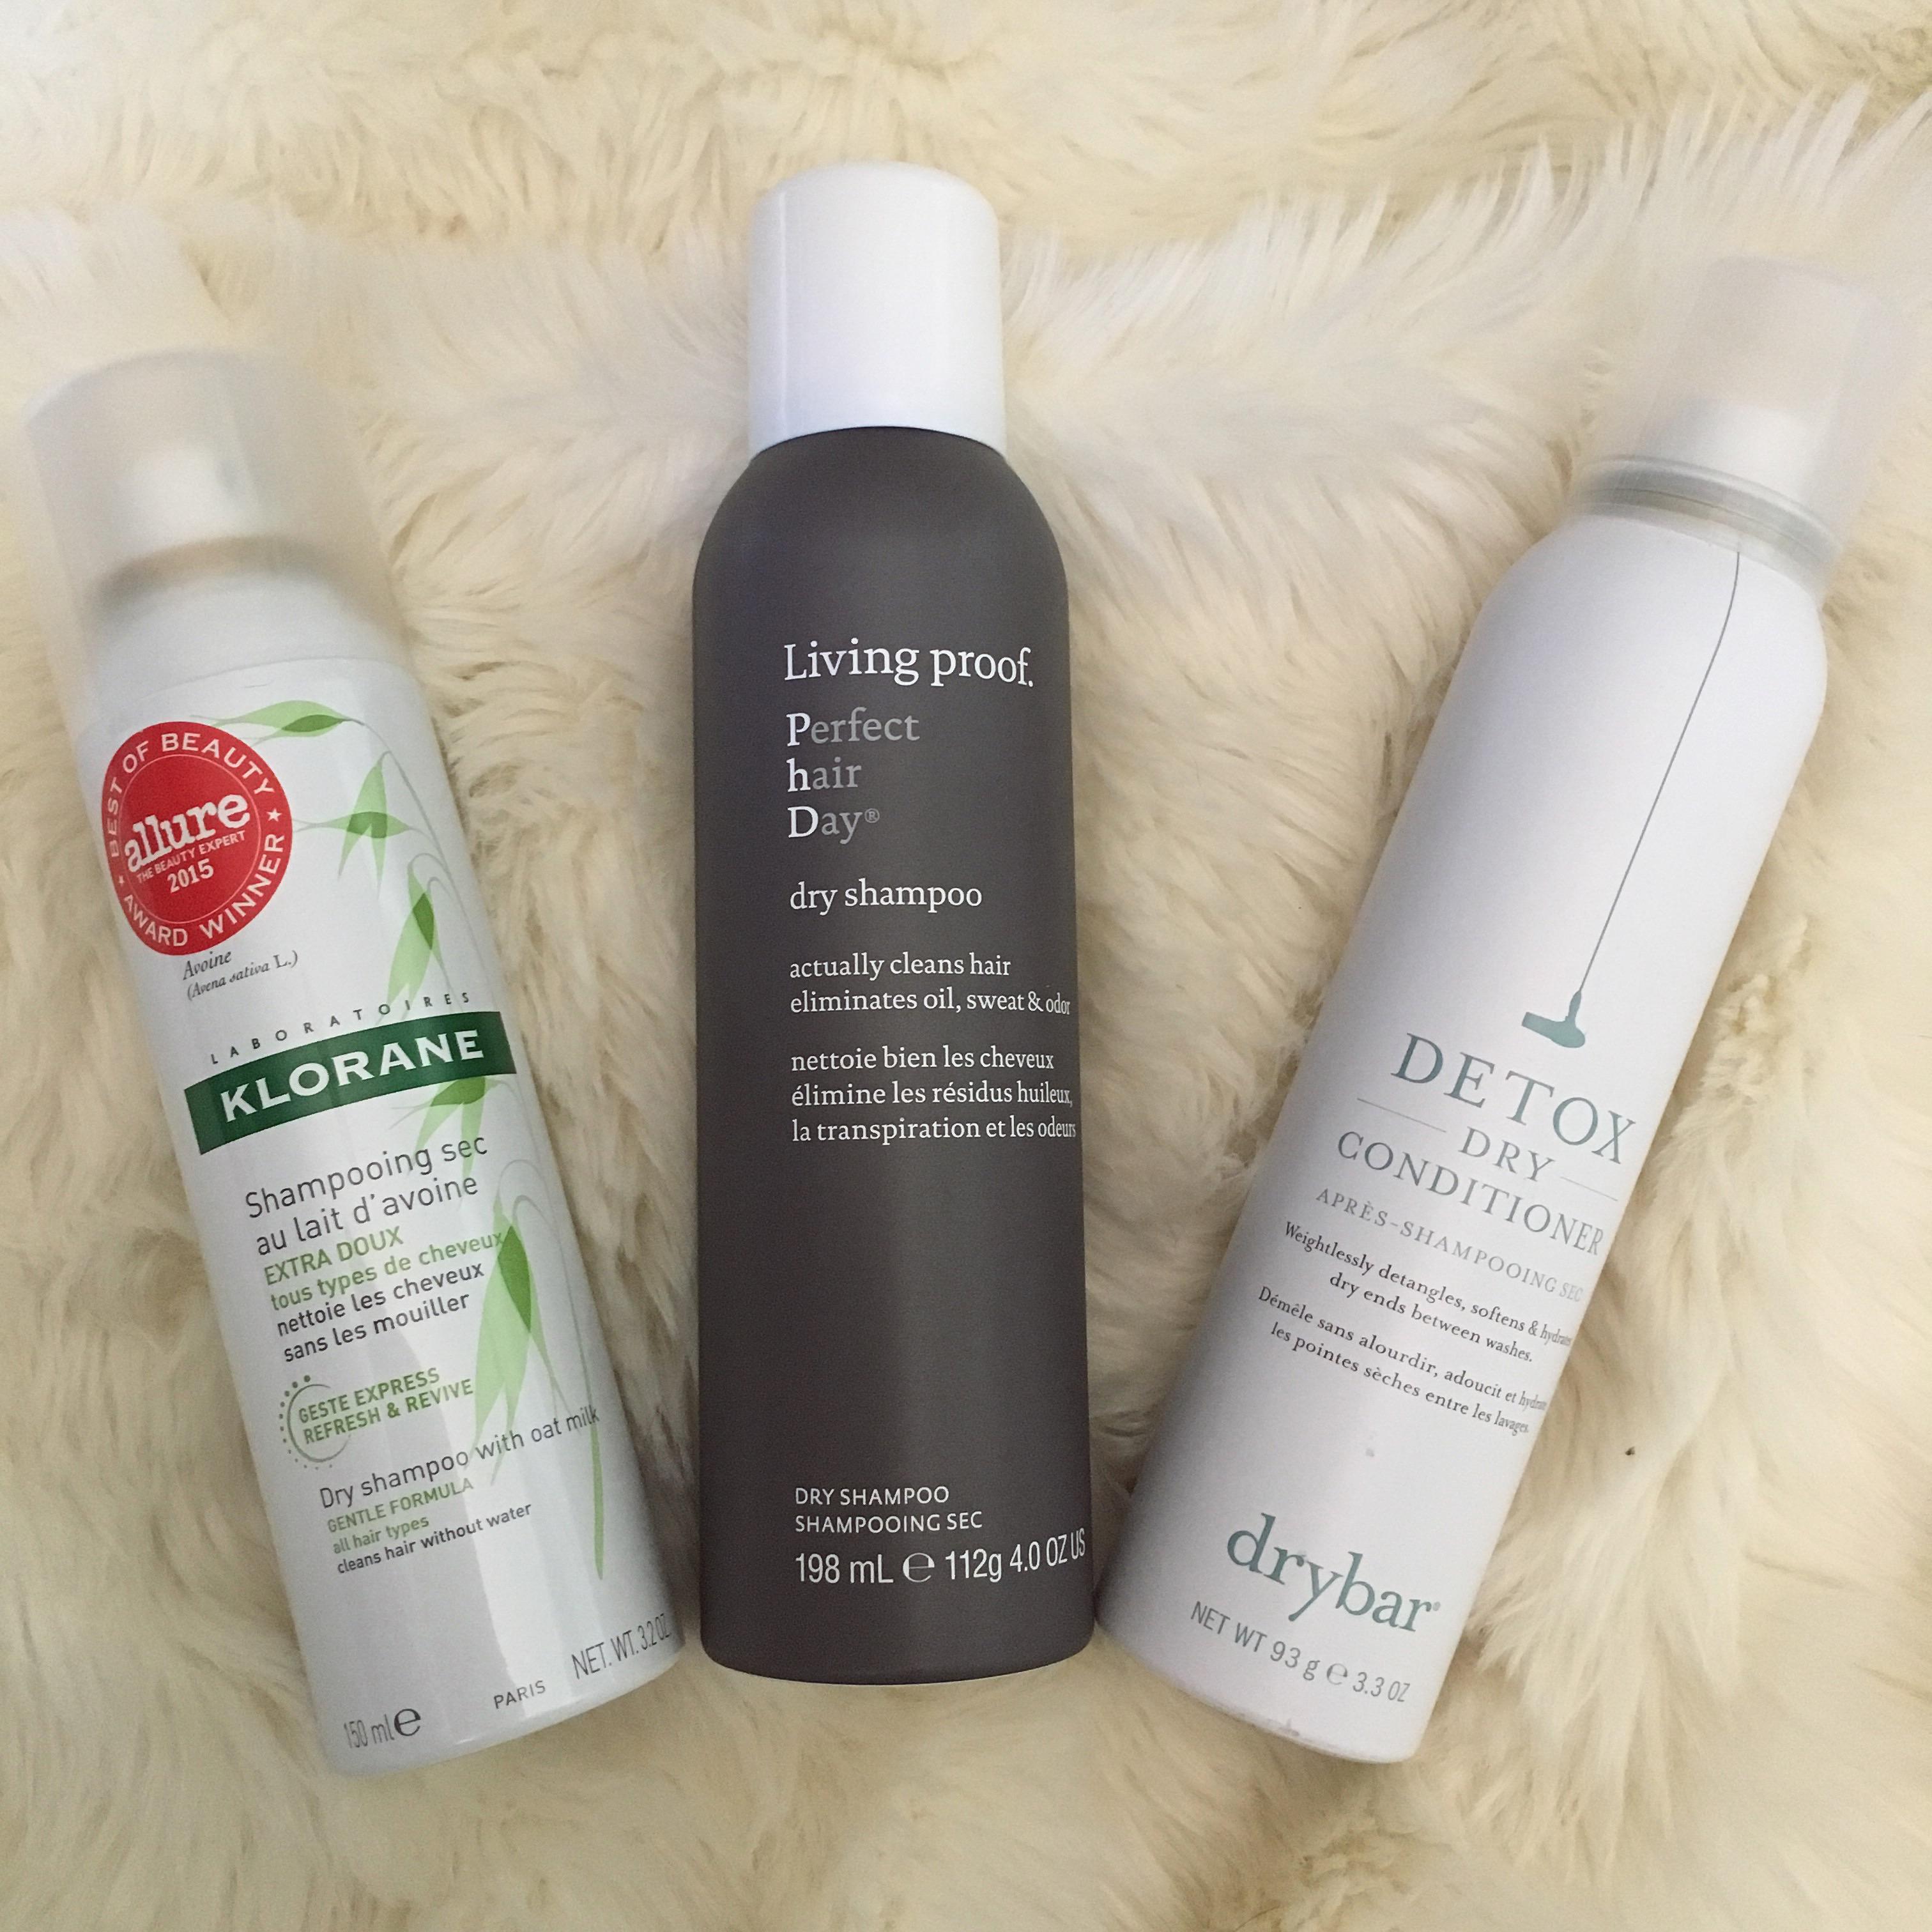 My Favorite Dry Shampoos